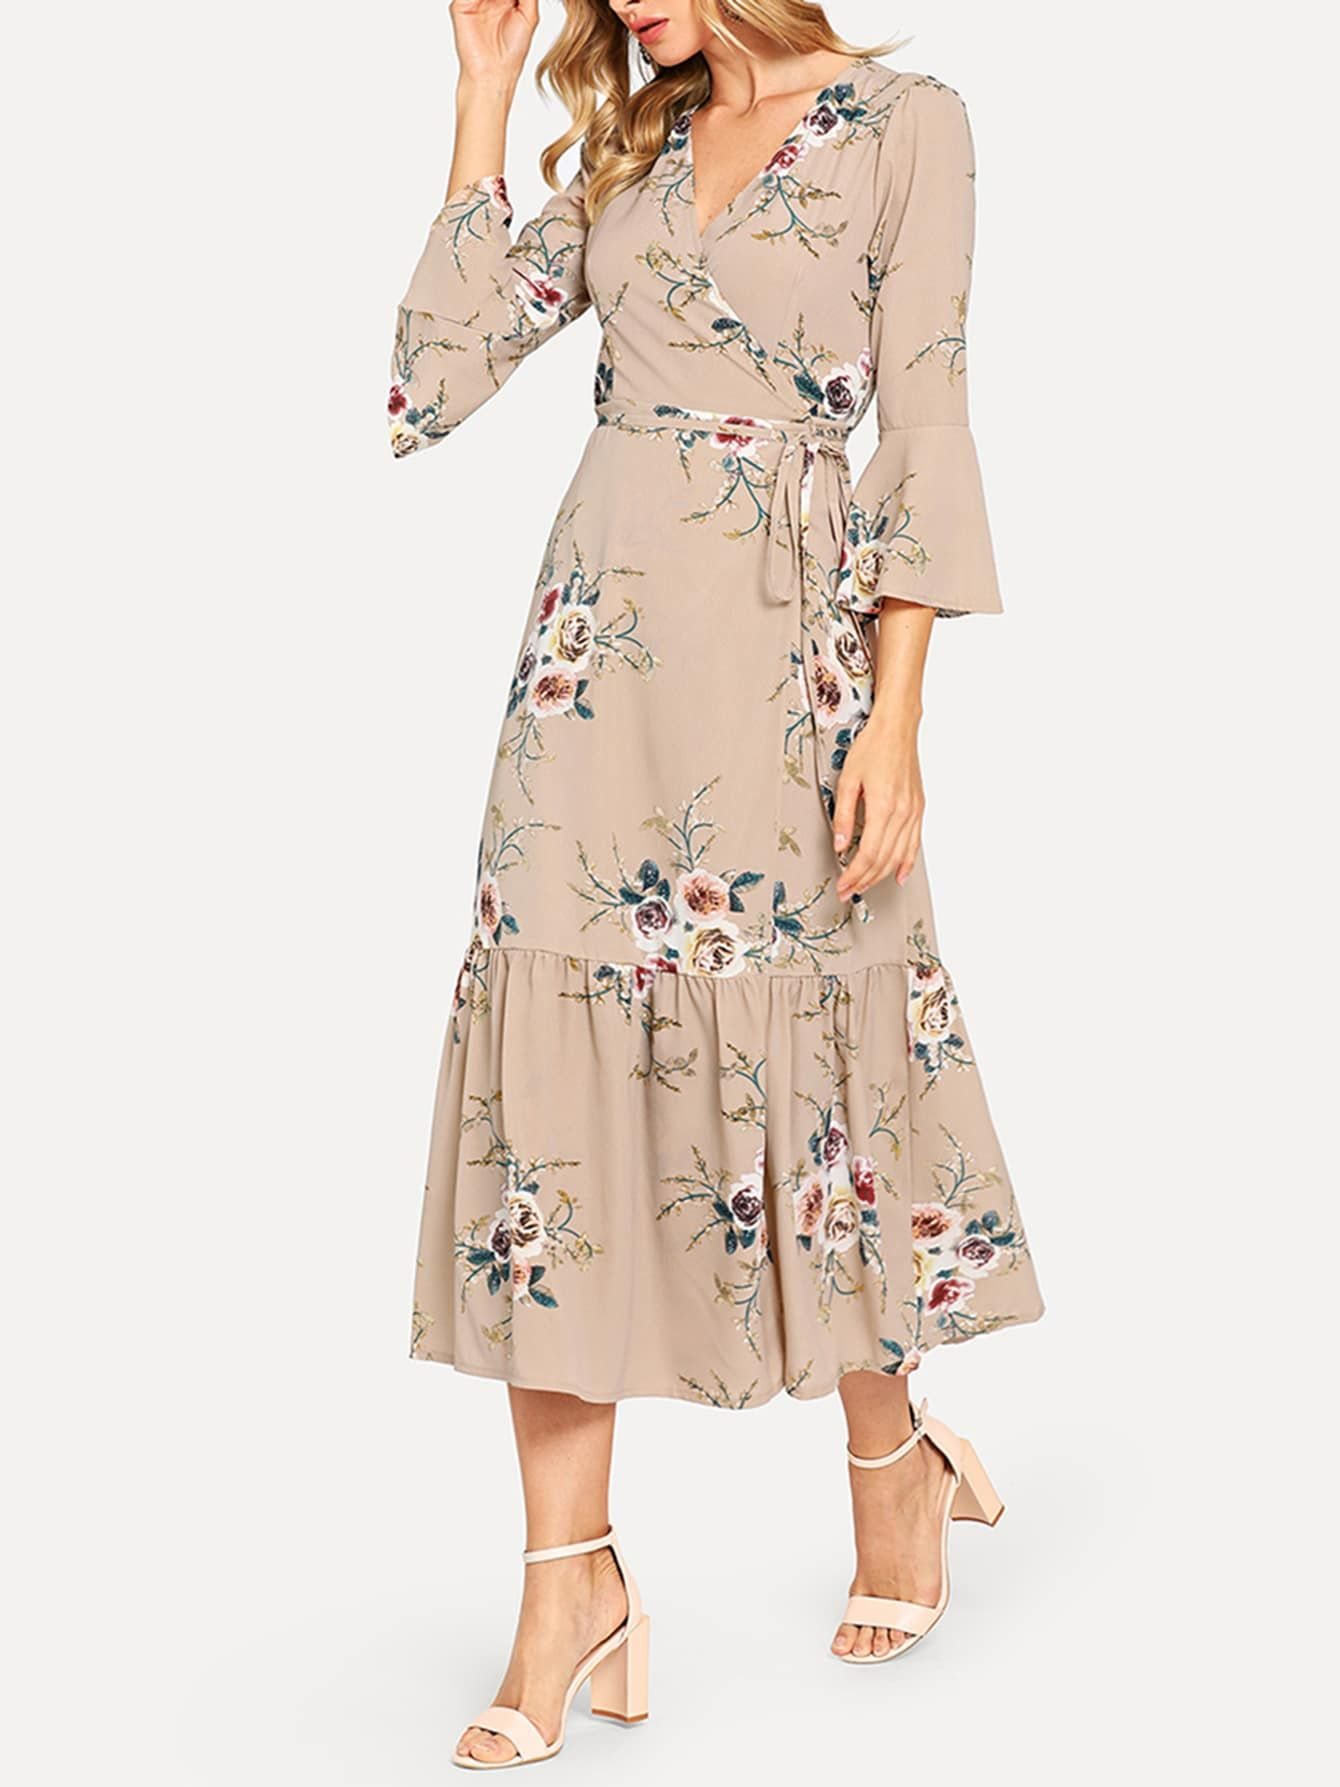 Floral Print Flounce Sleeve Knot Waist Dress Modest Dresses Dresses Fashion [ 1787 x 1340 Pixel ]